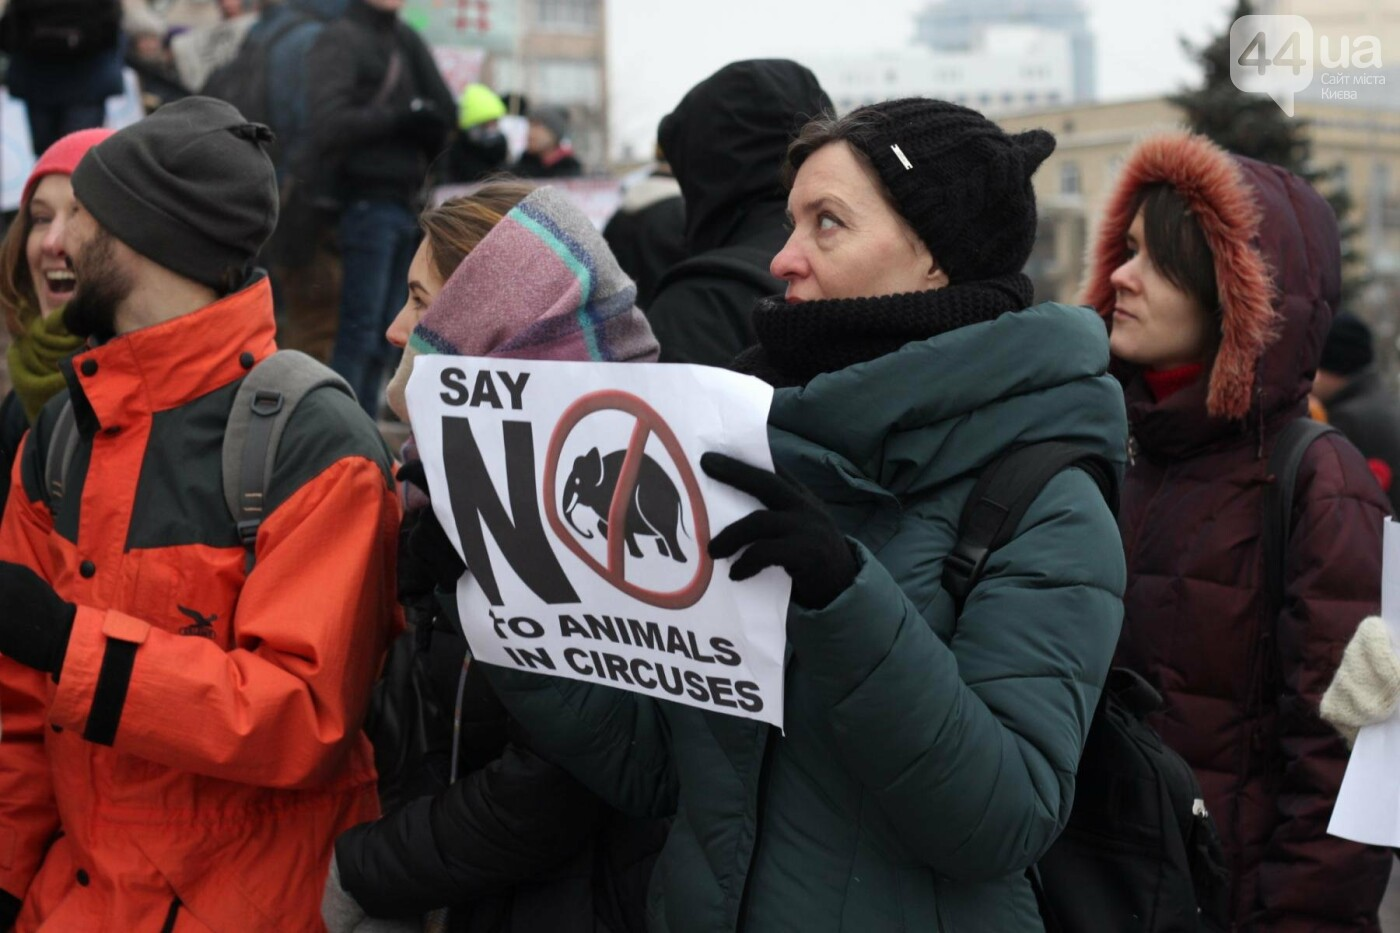 Цирк без животных: как в Киеве прошла акция протеста, фото-23